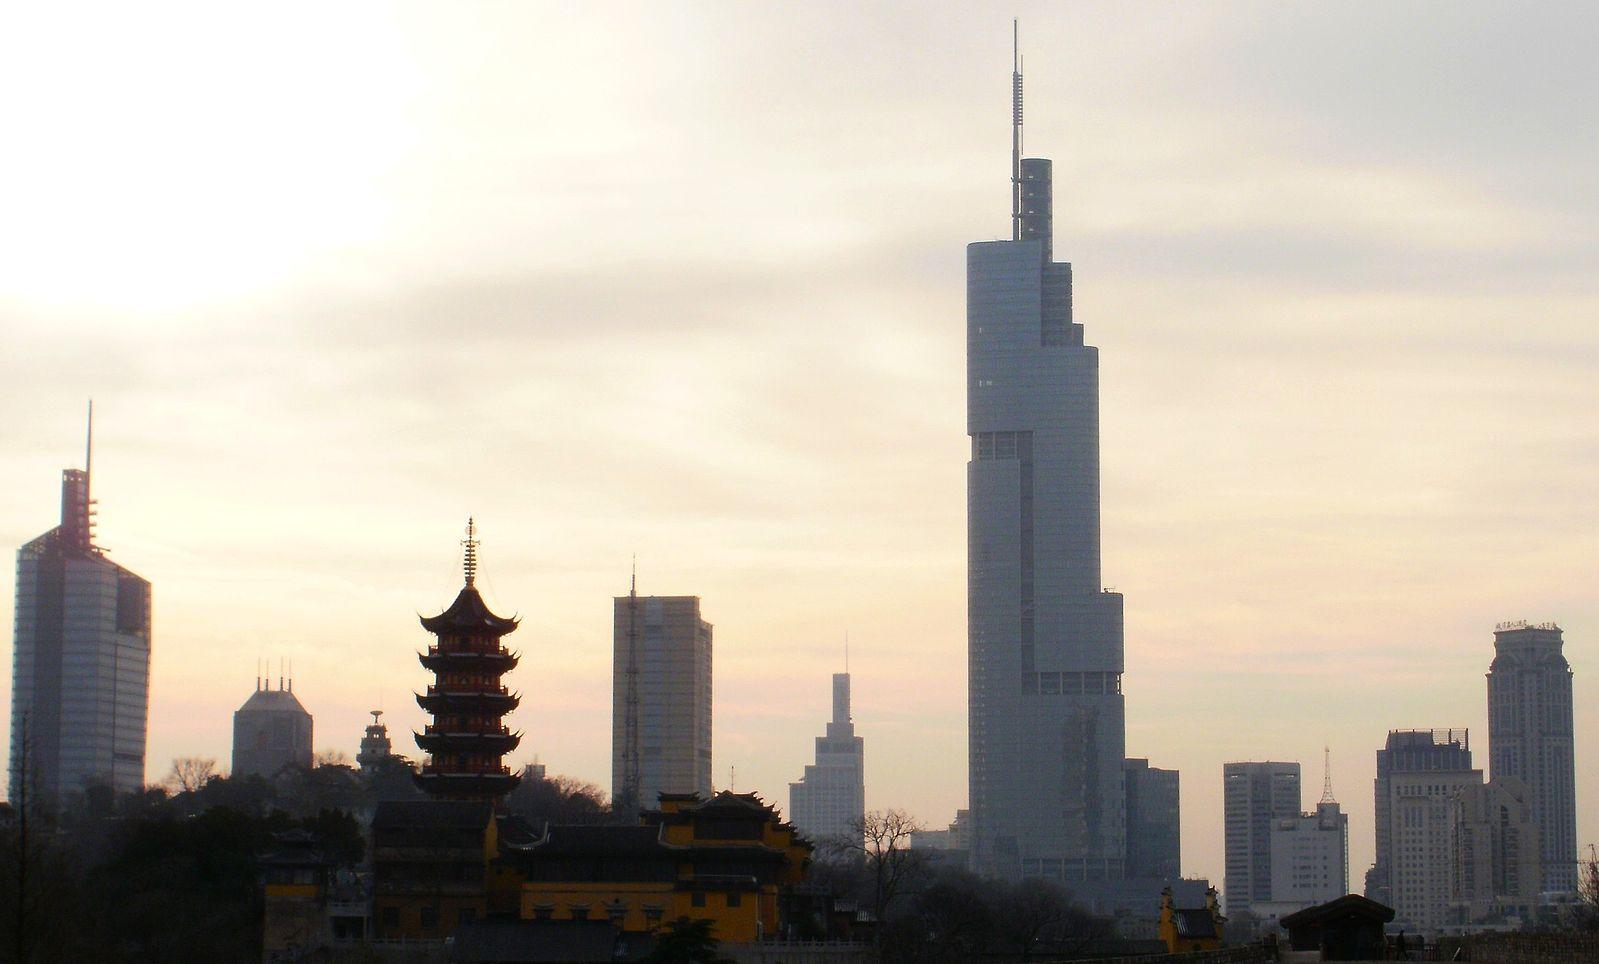 Taiwan Hopes to Avoid Politics in Scheduled Talks